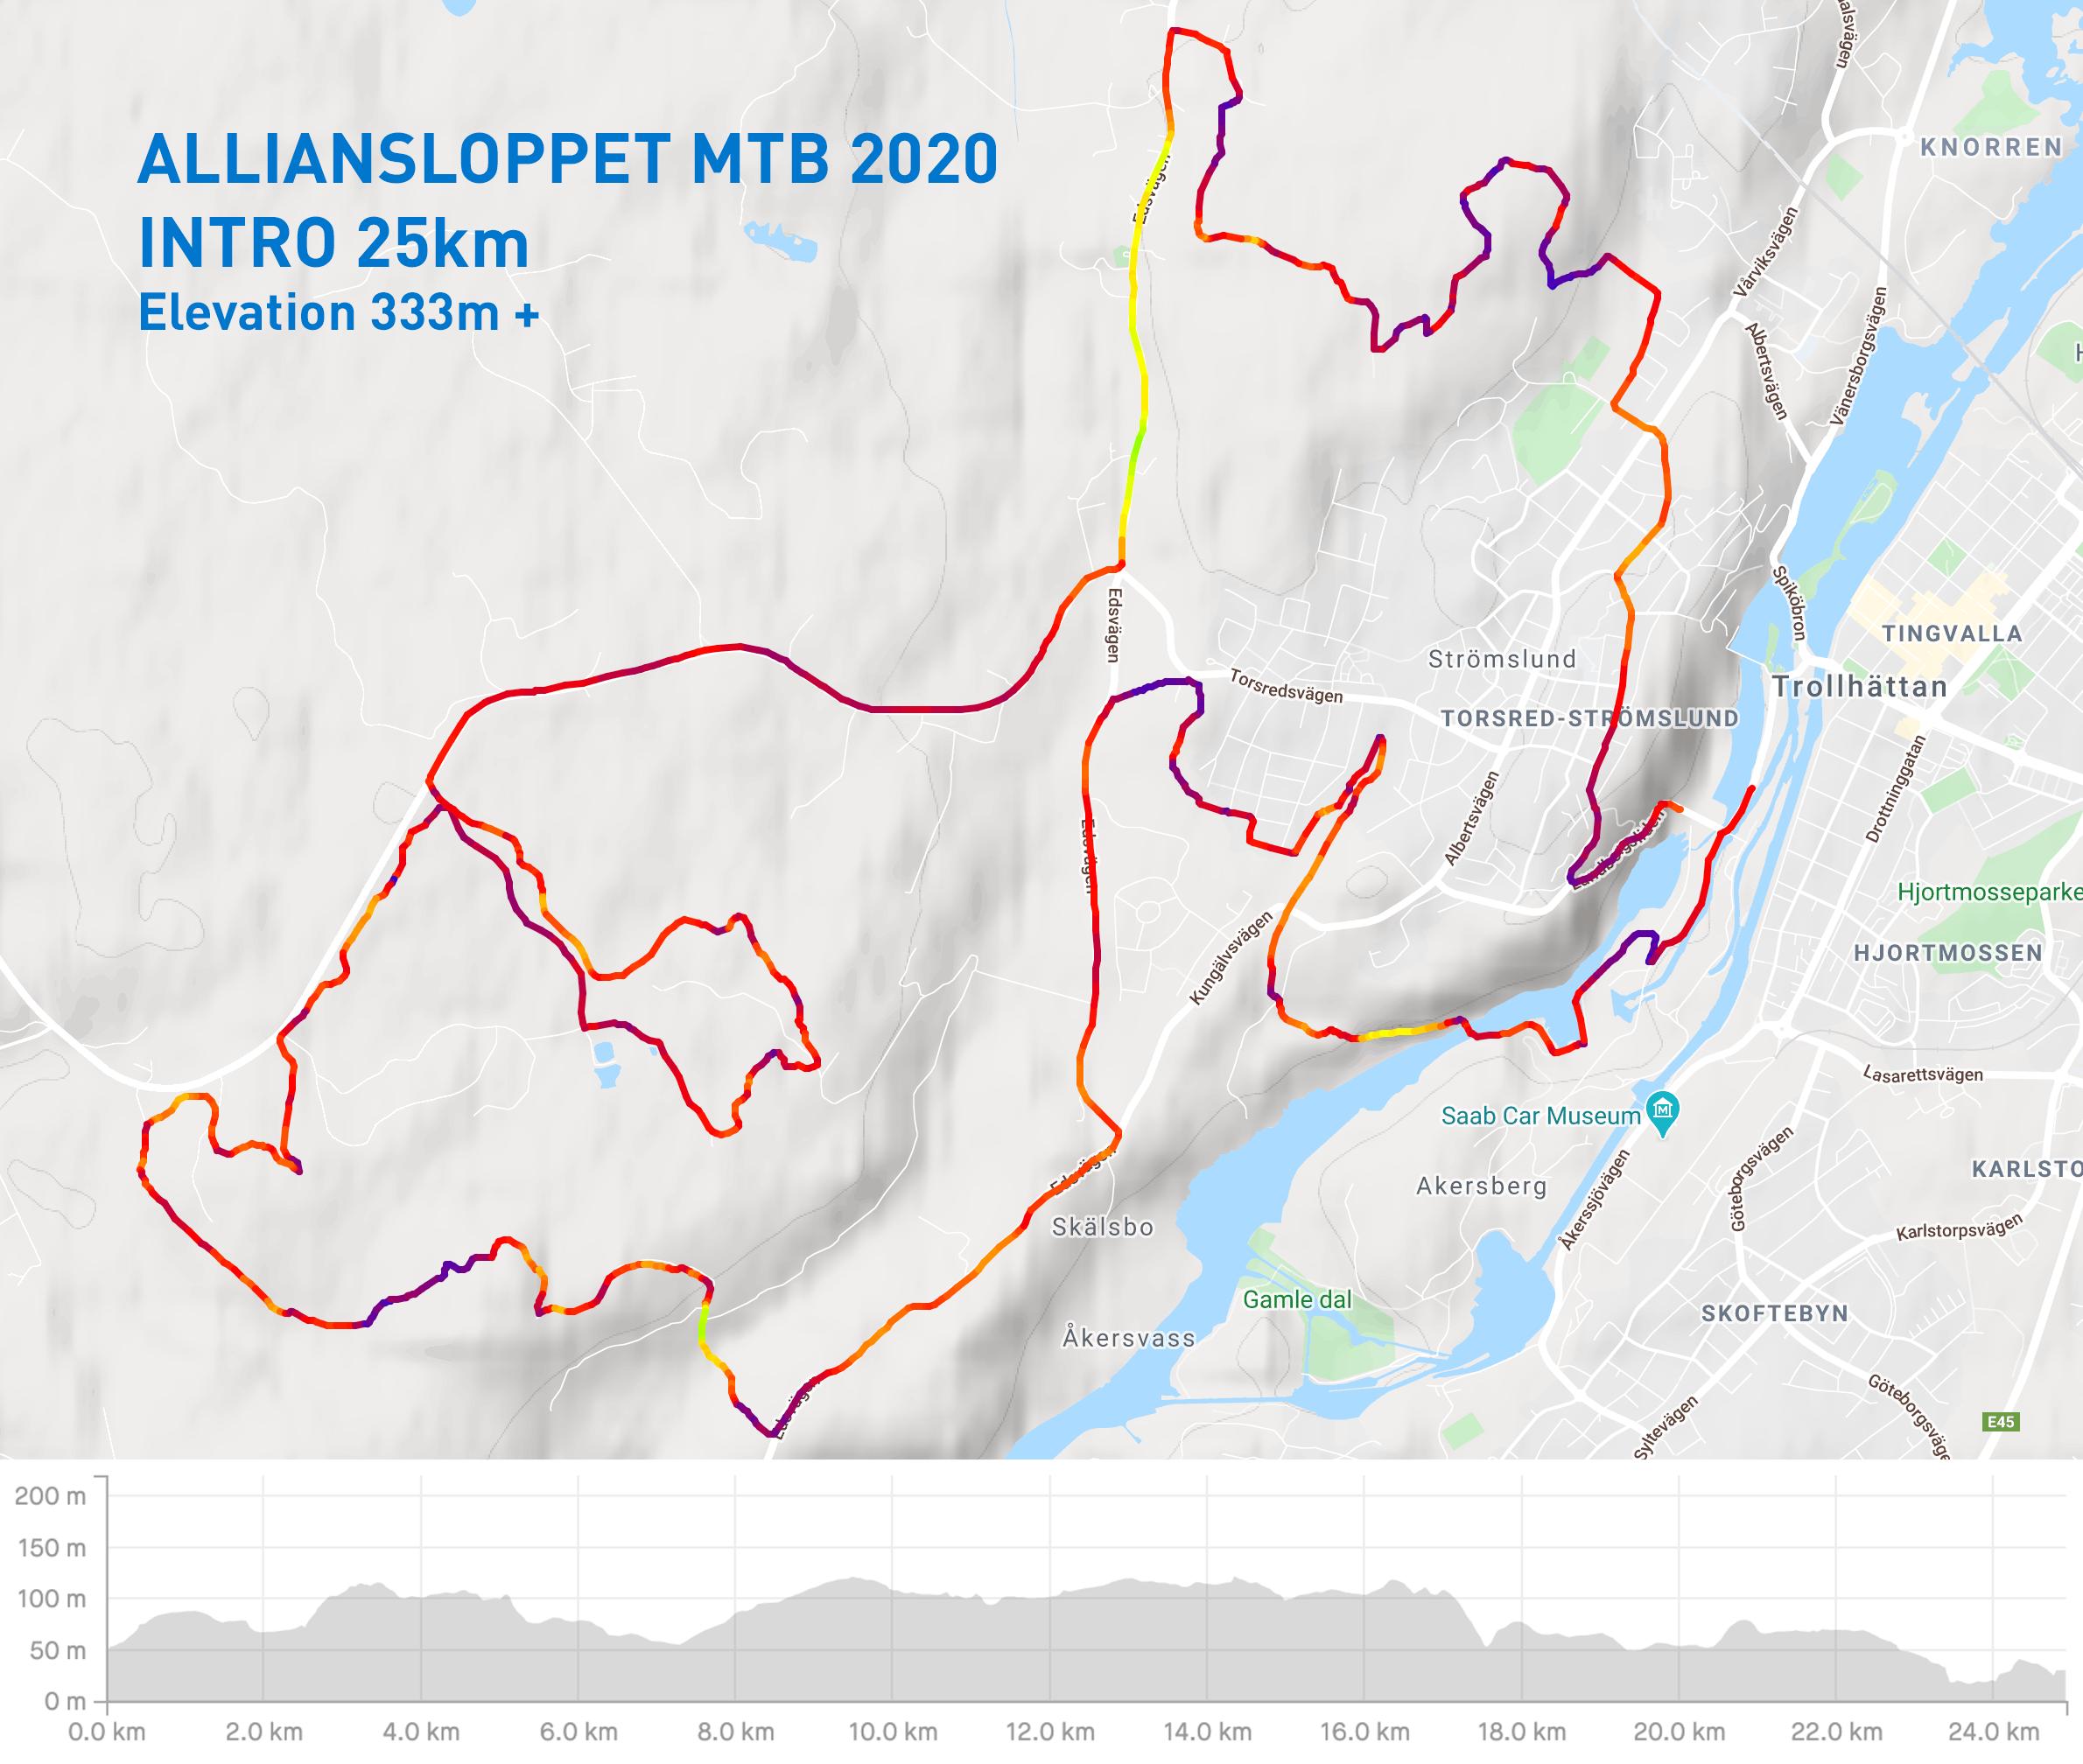 Alliansloppet MTB intro 25km 2020